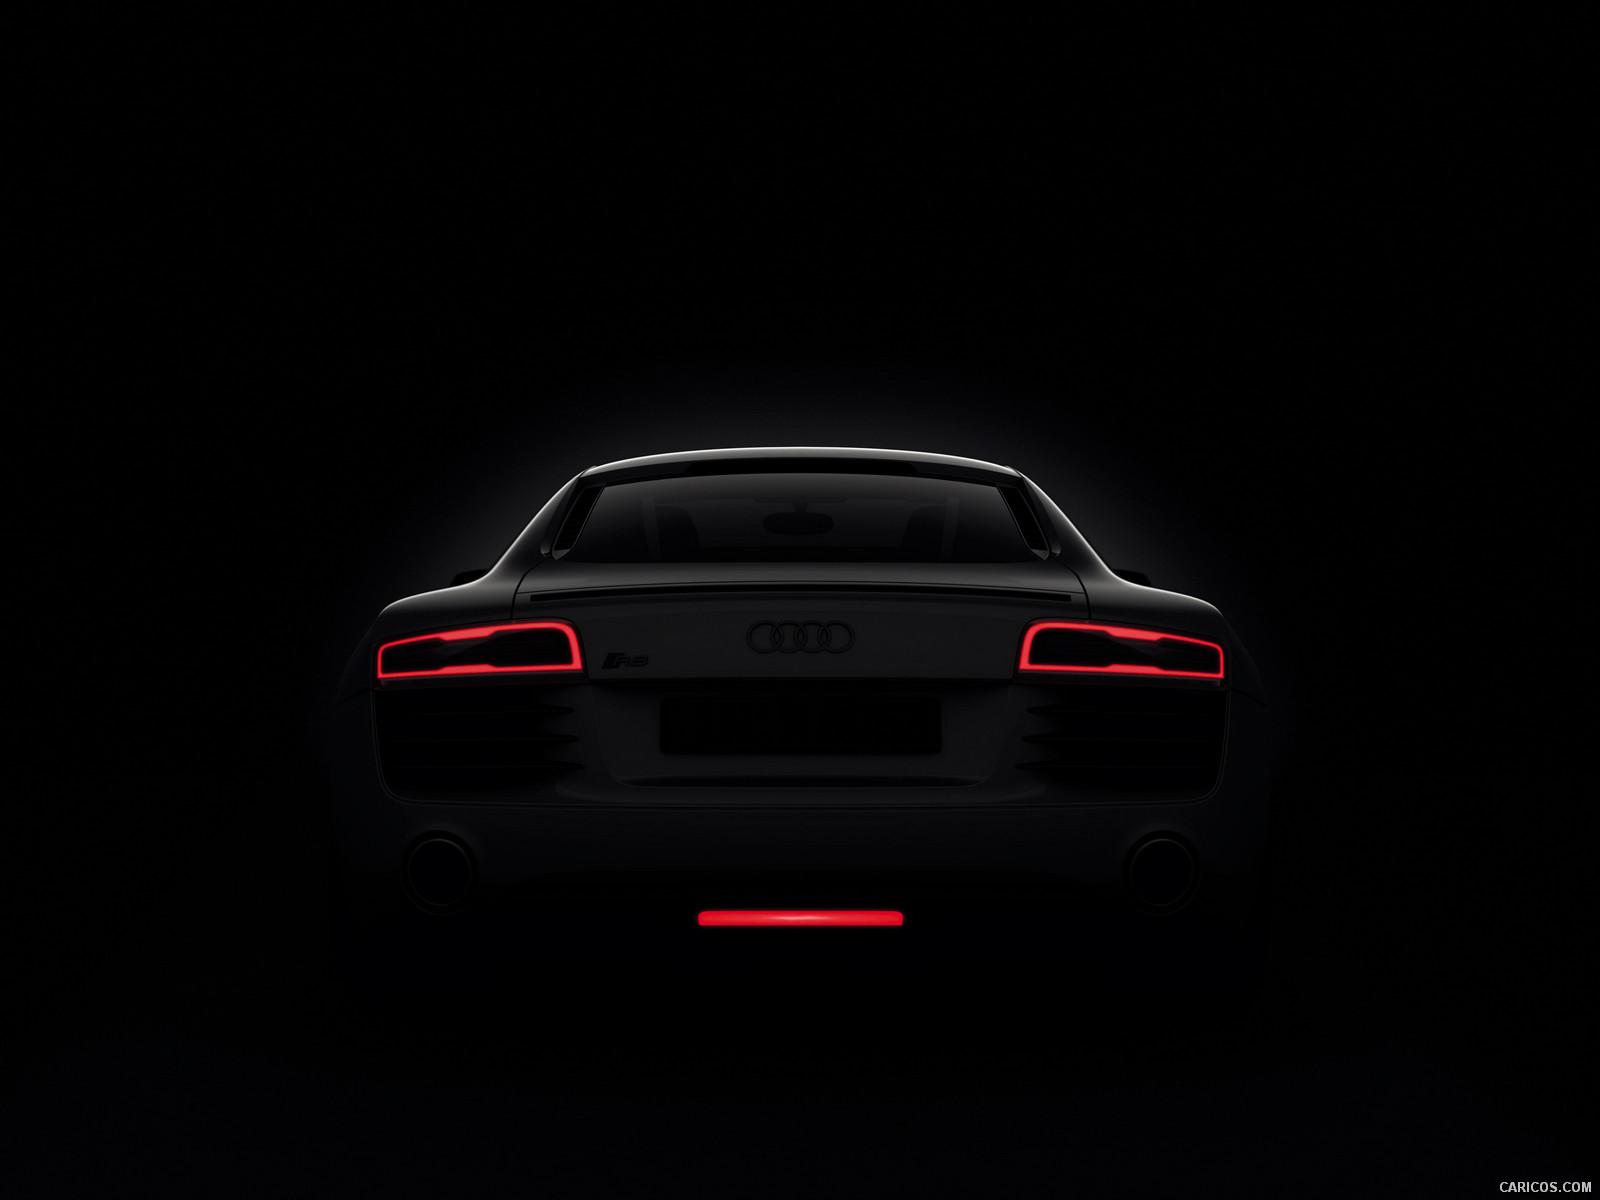 2013 Audi R8 LED Tail Lights - Wallpaper